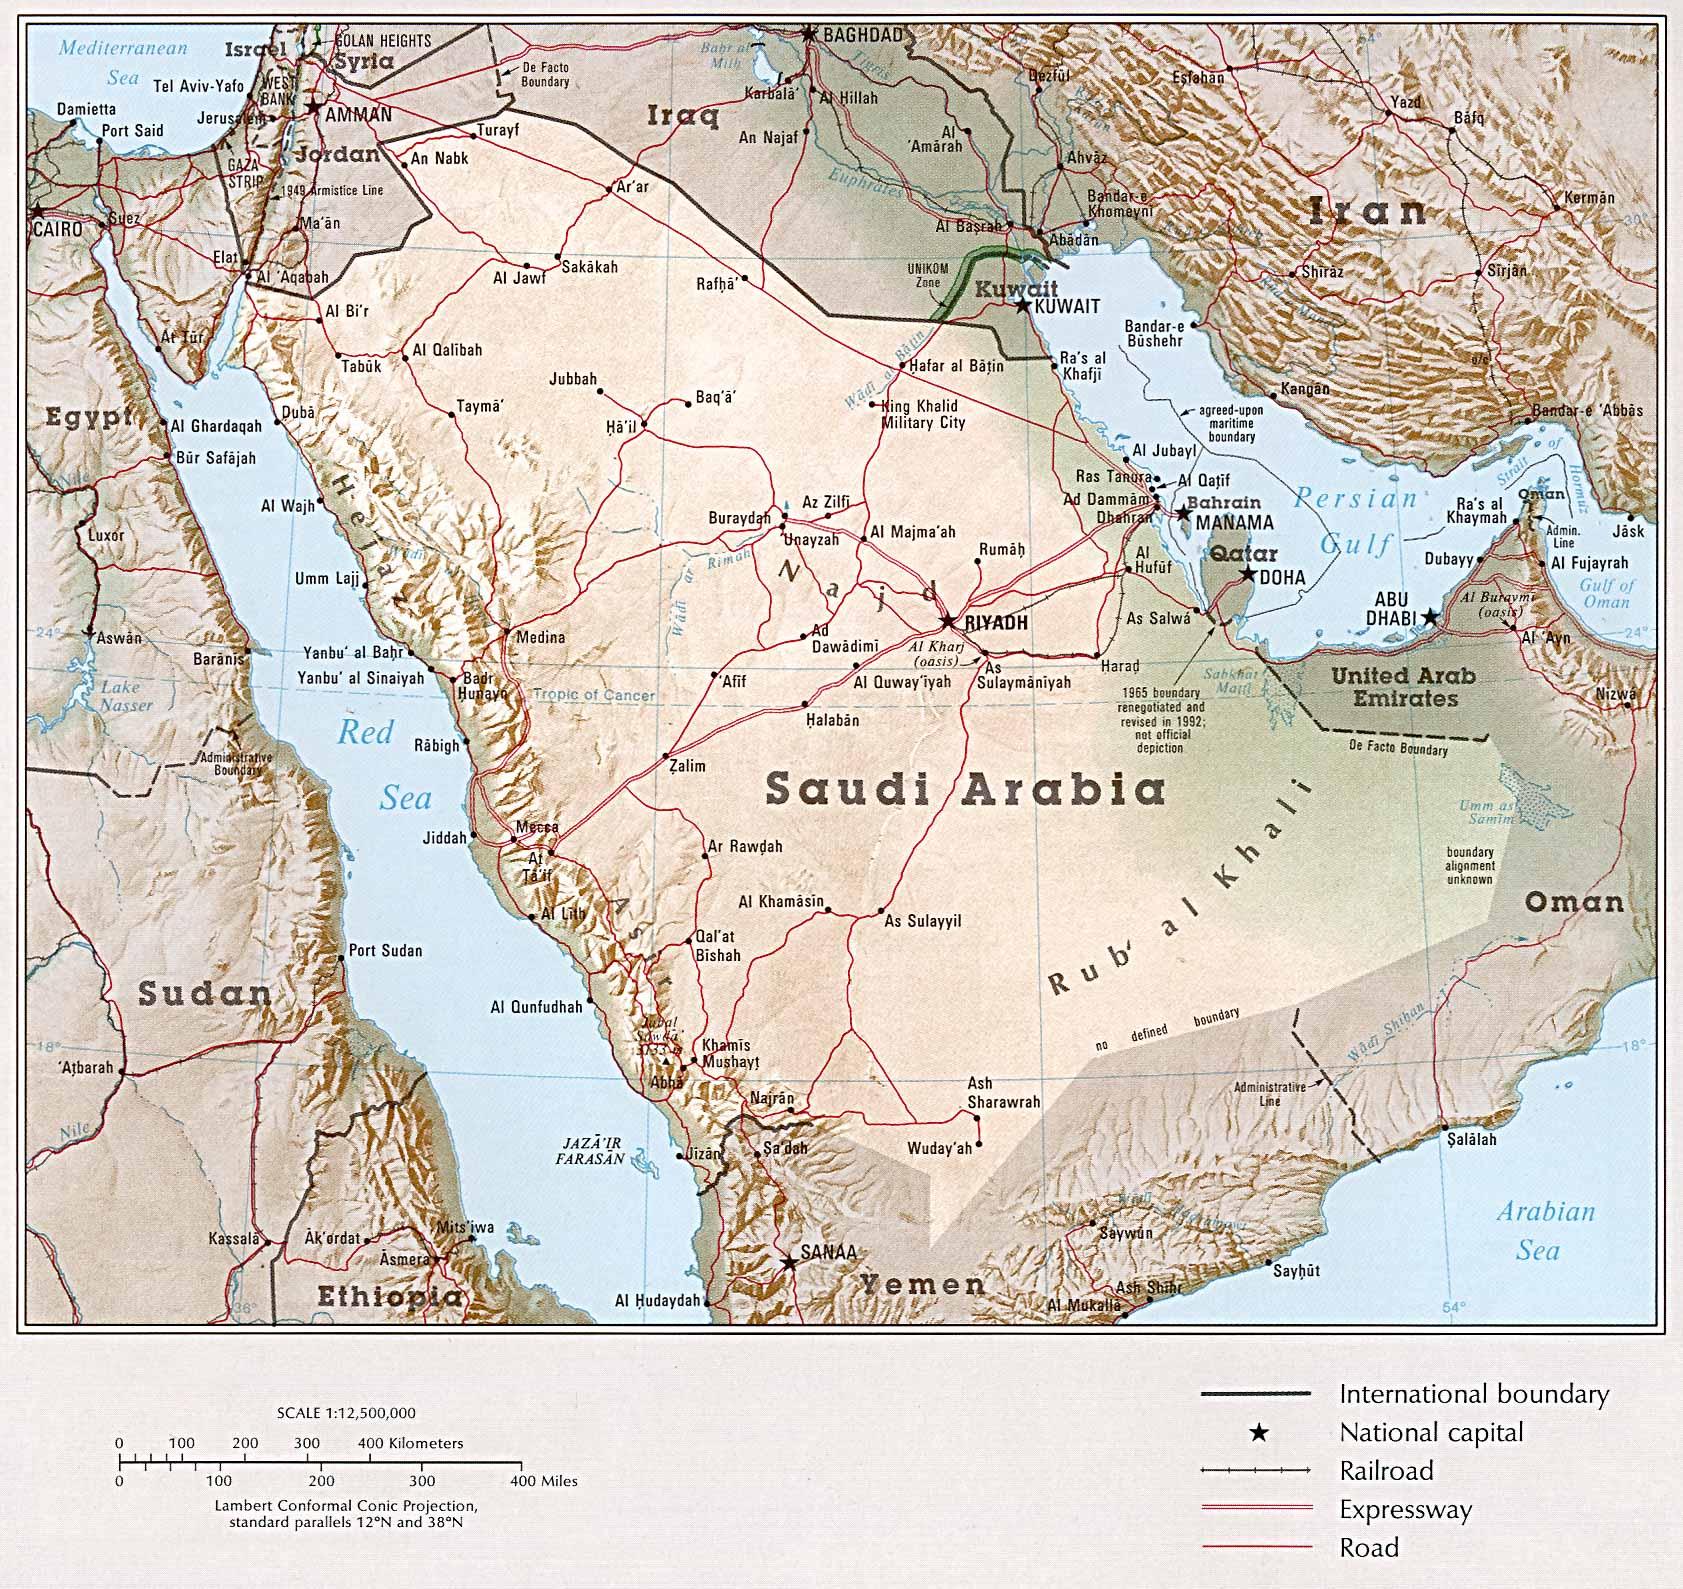 Saudi Arabia Map mappery